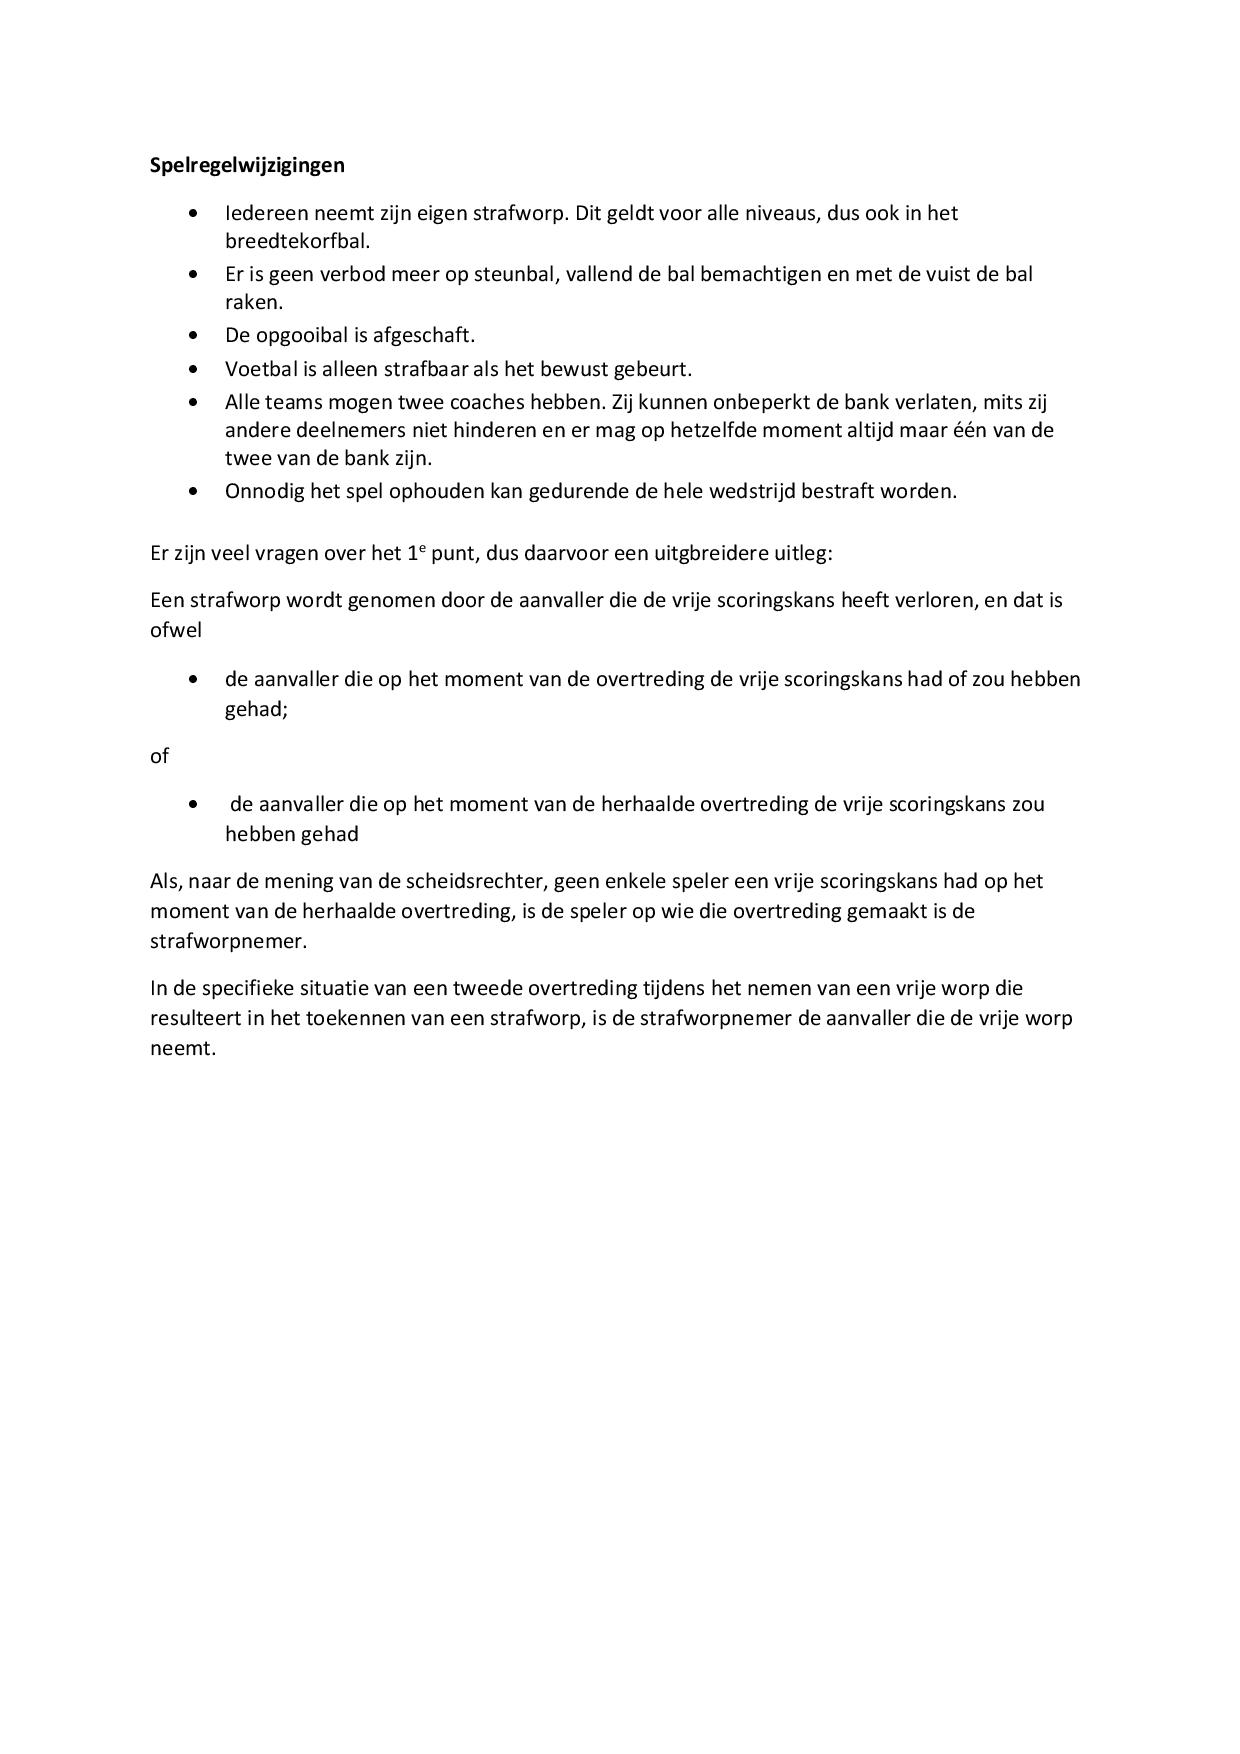 Spelregelwijziging september 2020